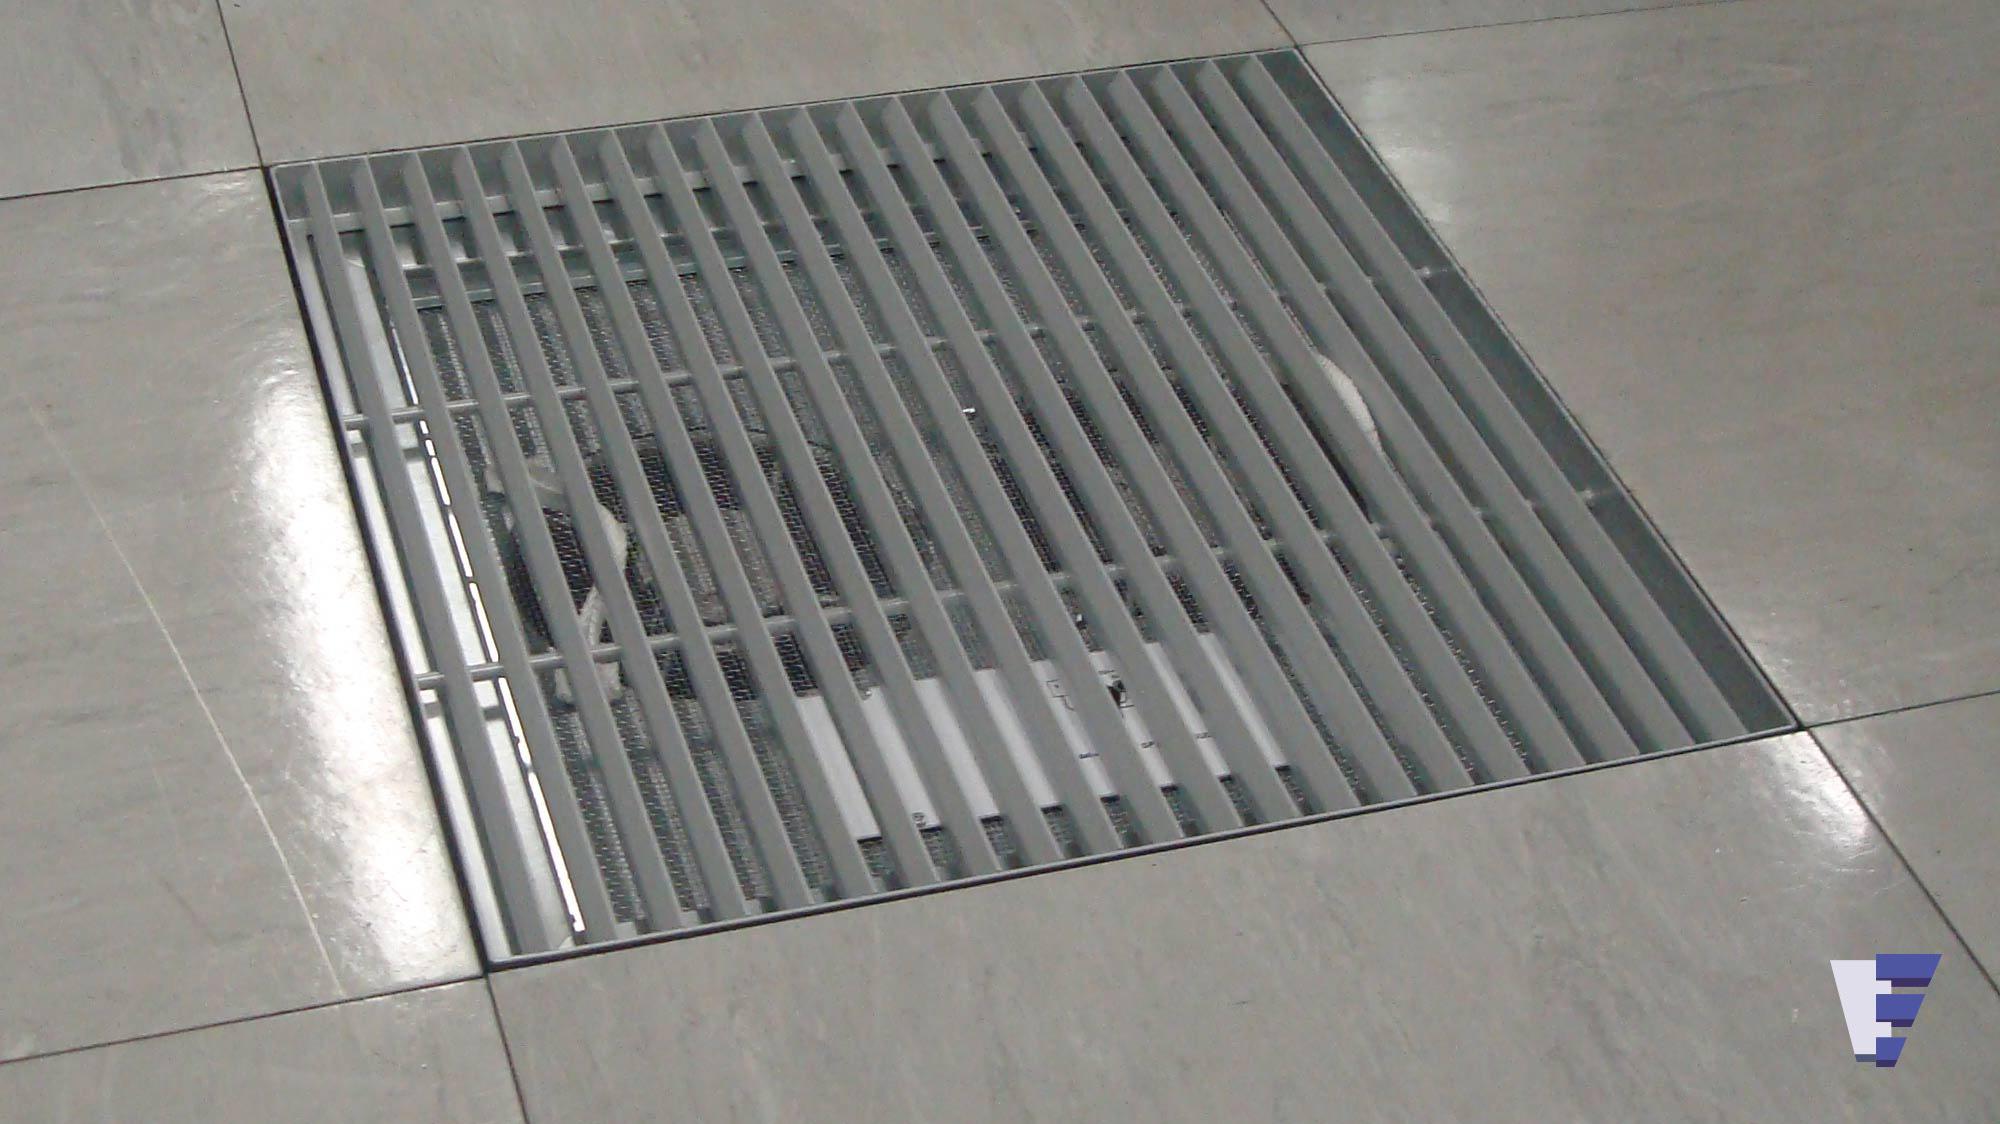 Velčić d.o.o. - Podna ventilatorska jedinica - Precizna klimat